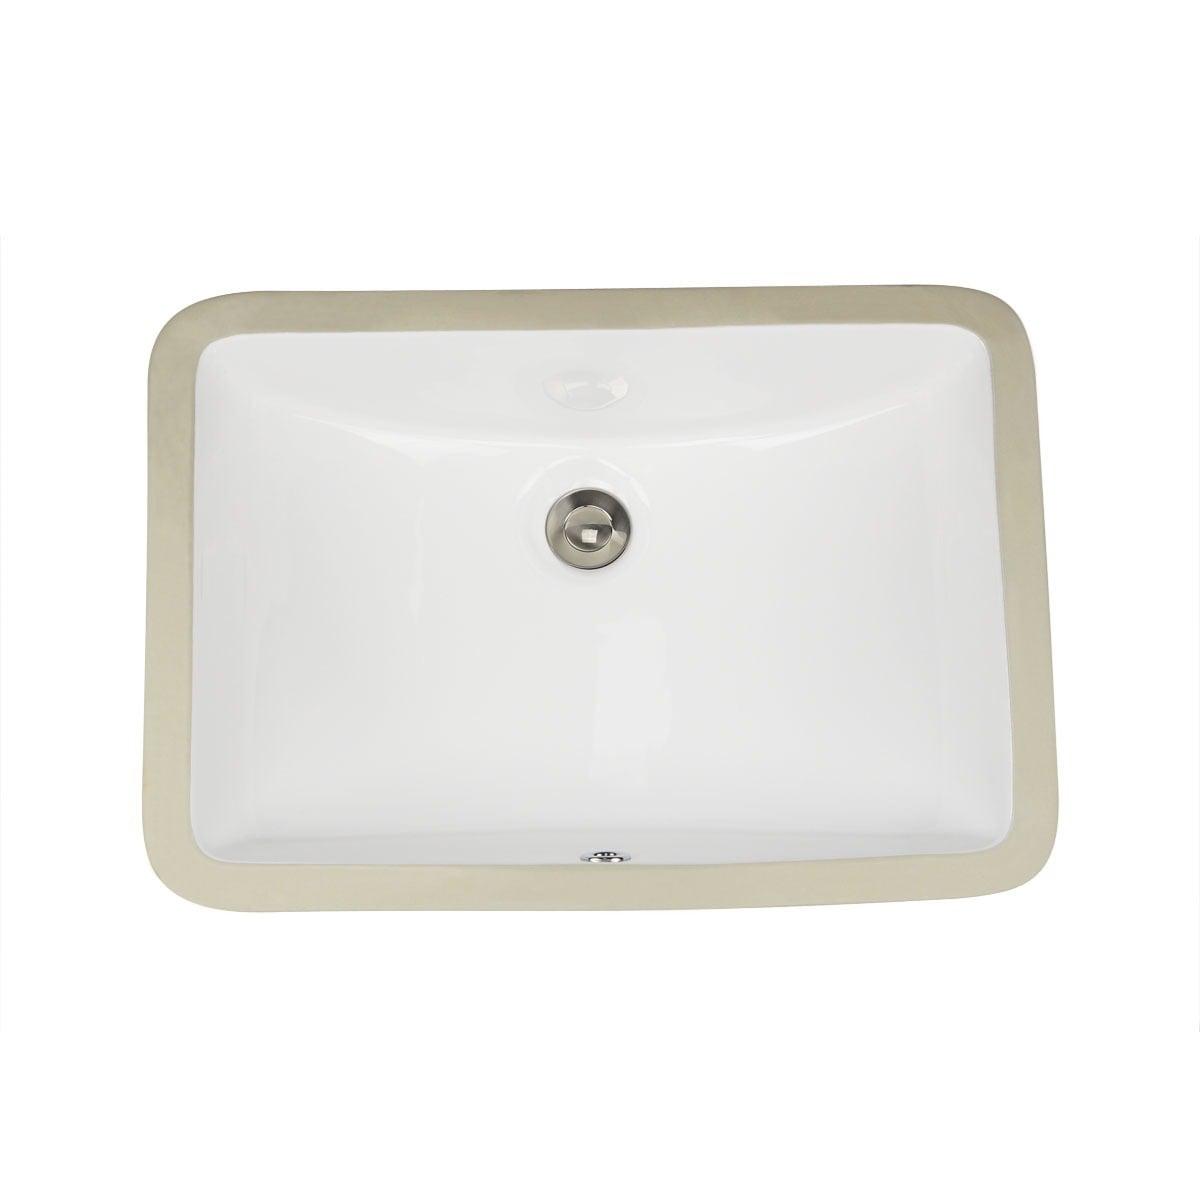 Shop Highpoint Collection White Ceramic Undermount Vanity Sink ...